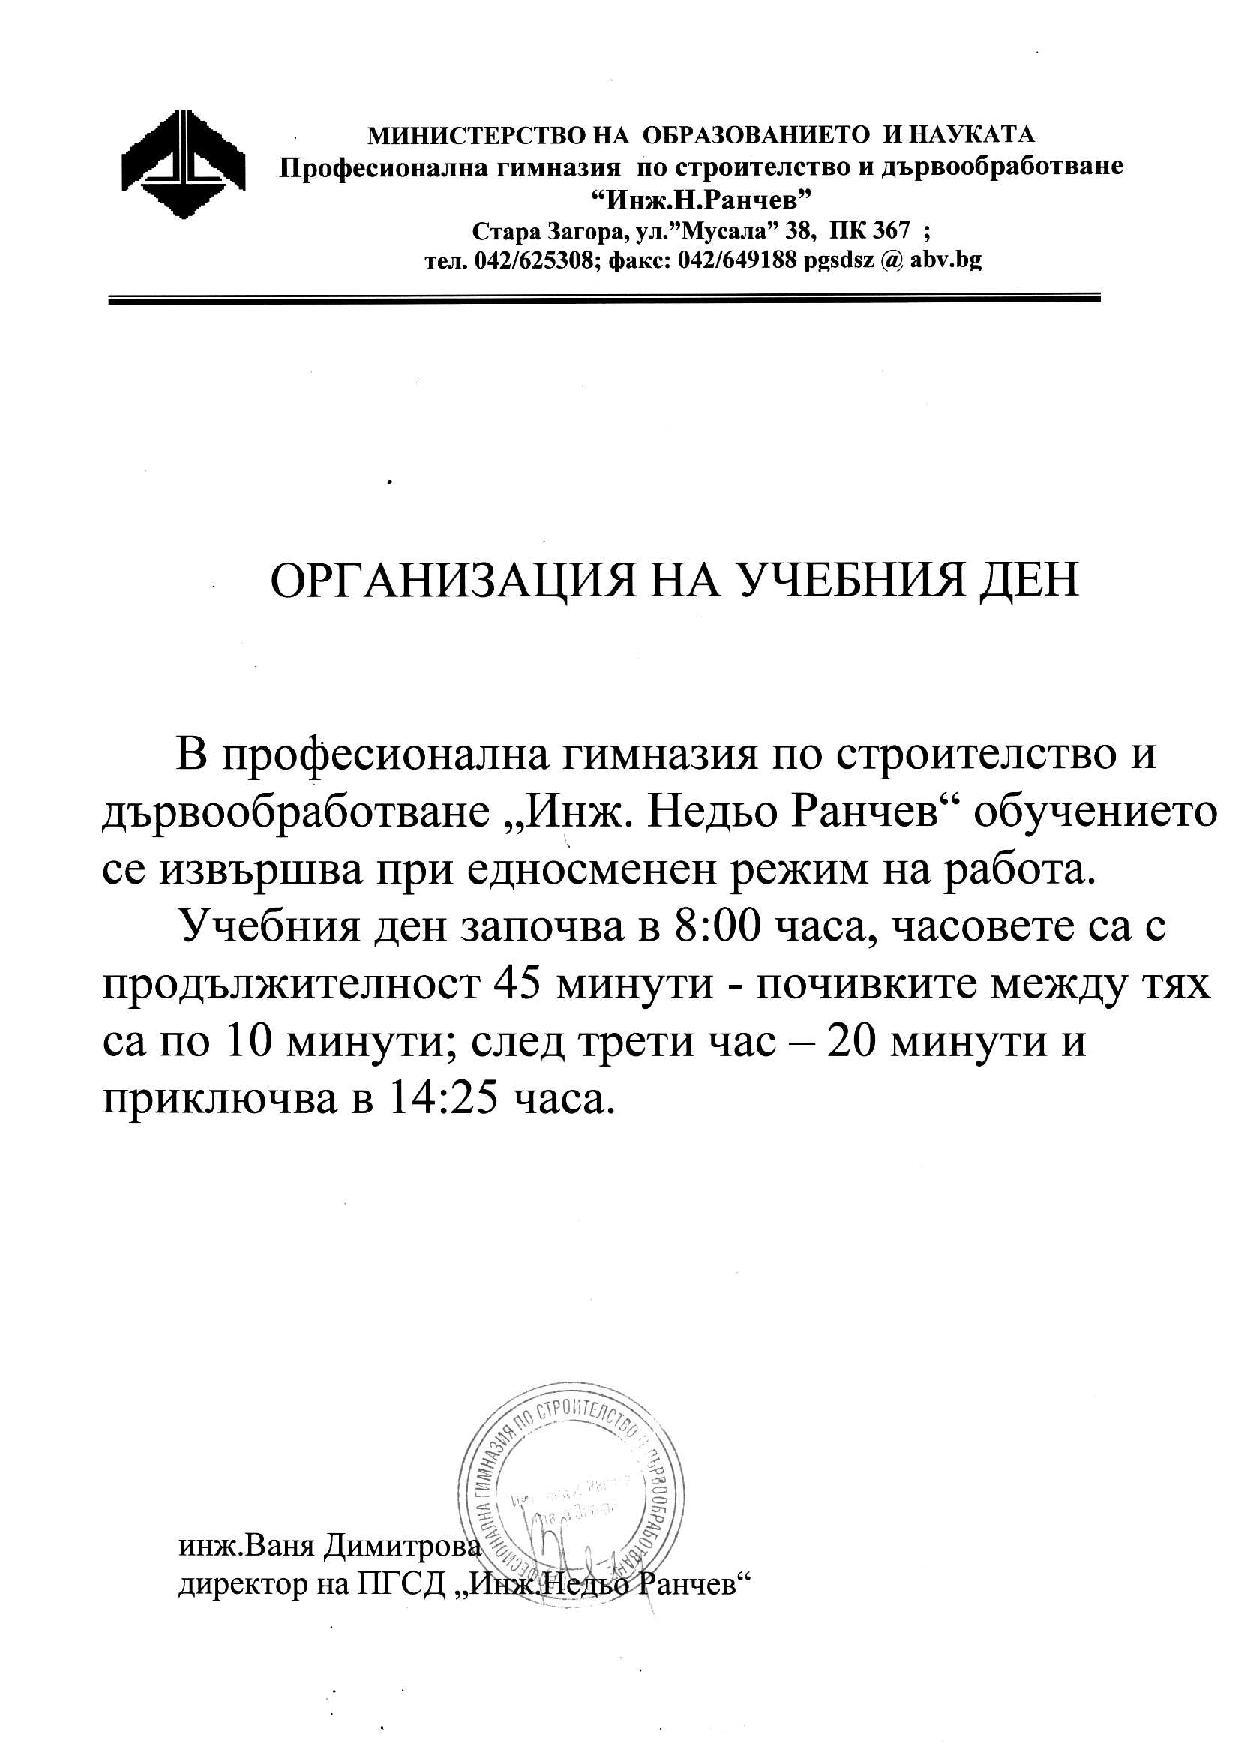 организация-page-001